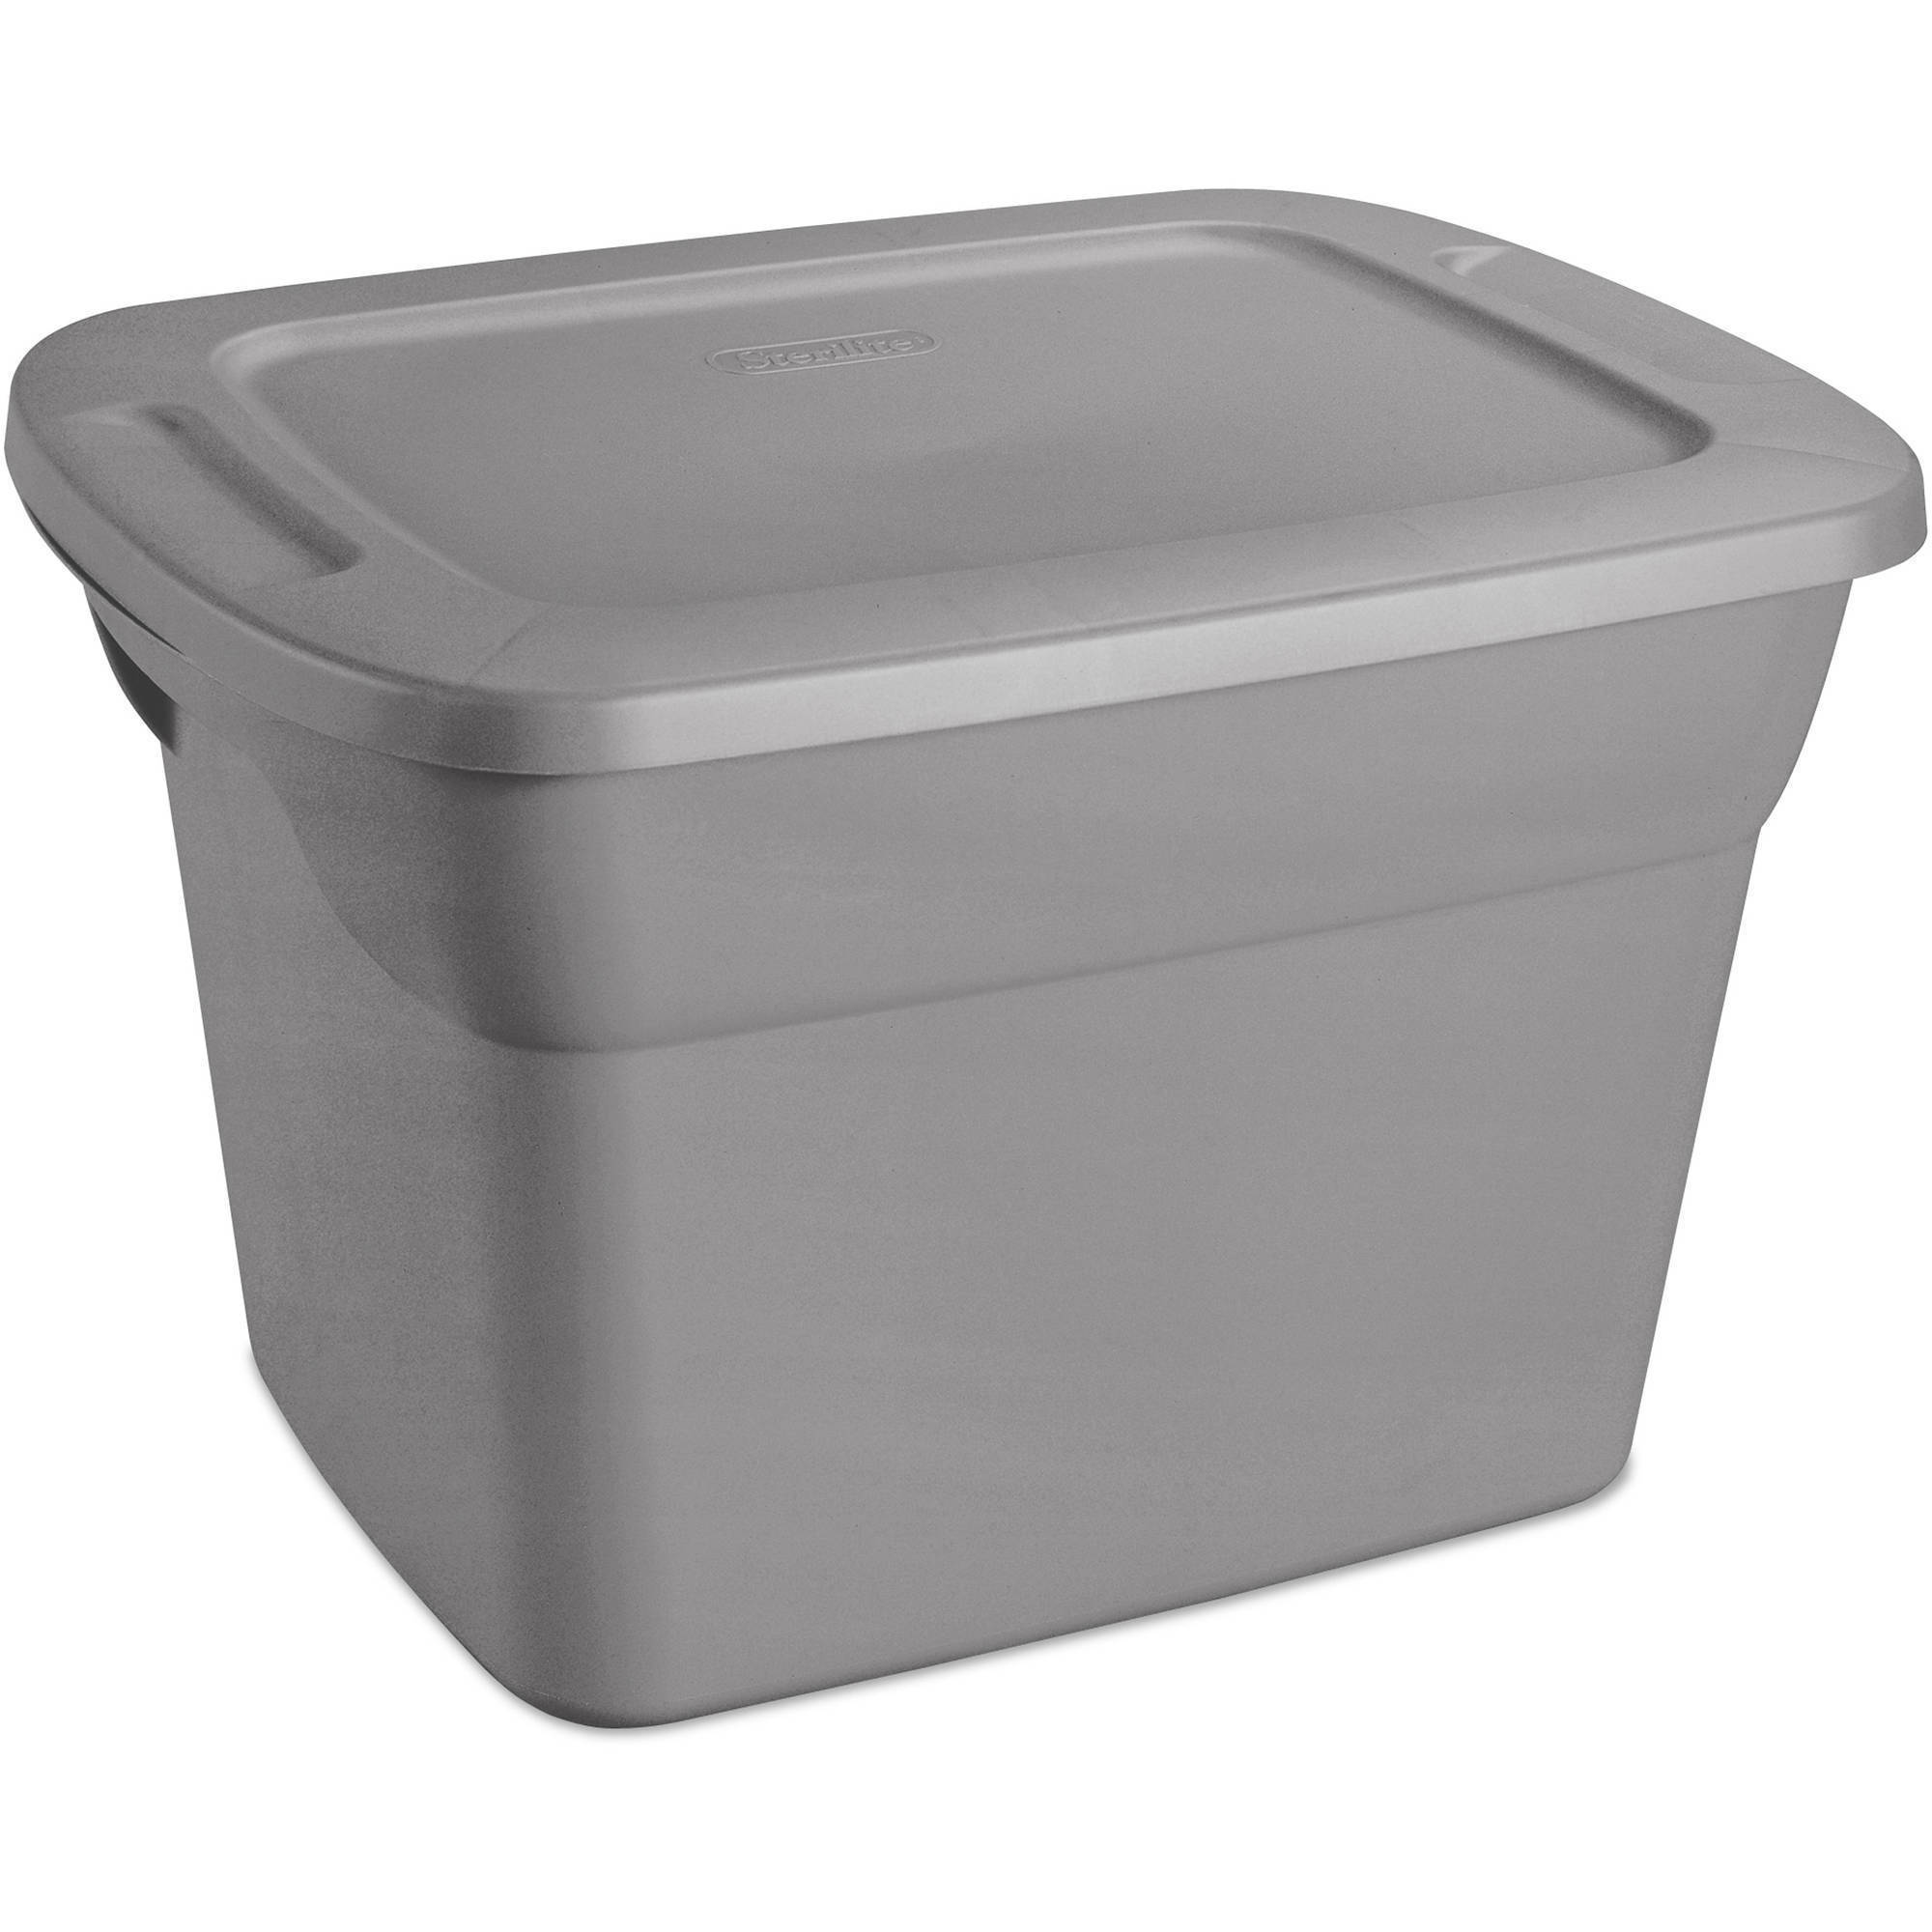 Sterilite 18 Gal Tote Box, Steel (Single Unit)   Walmart.com